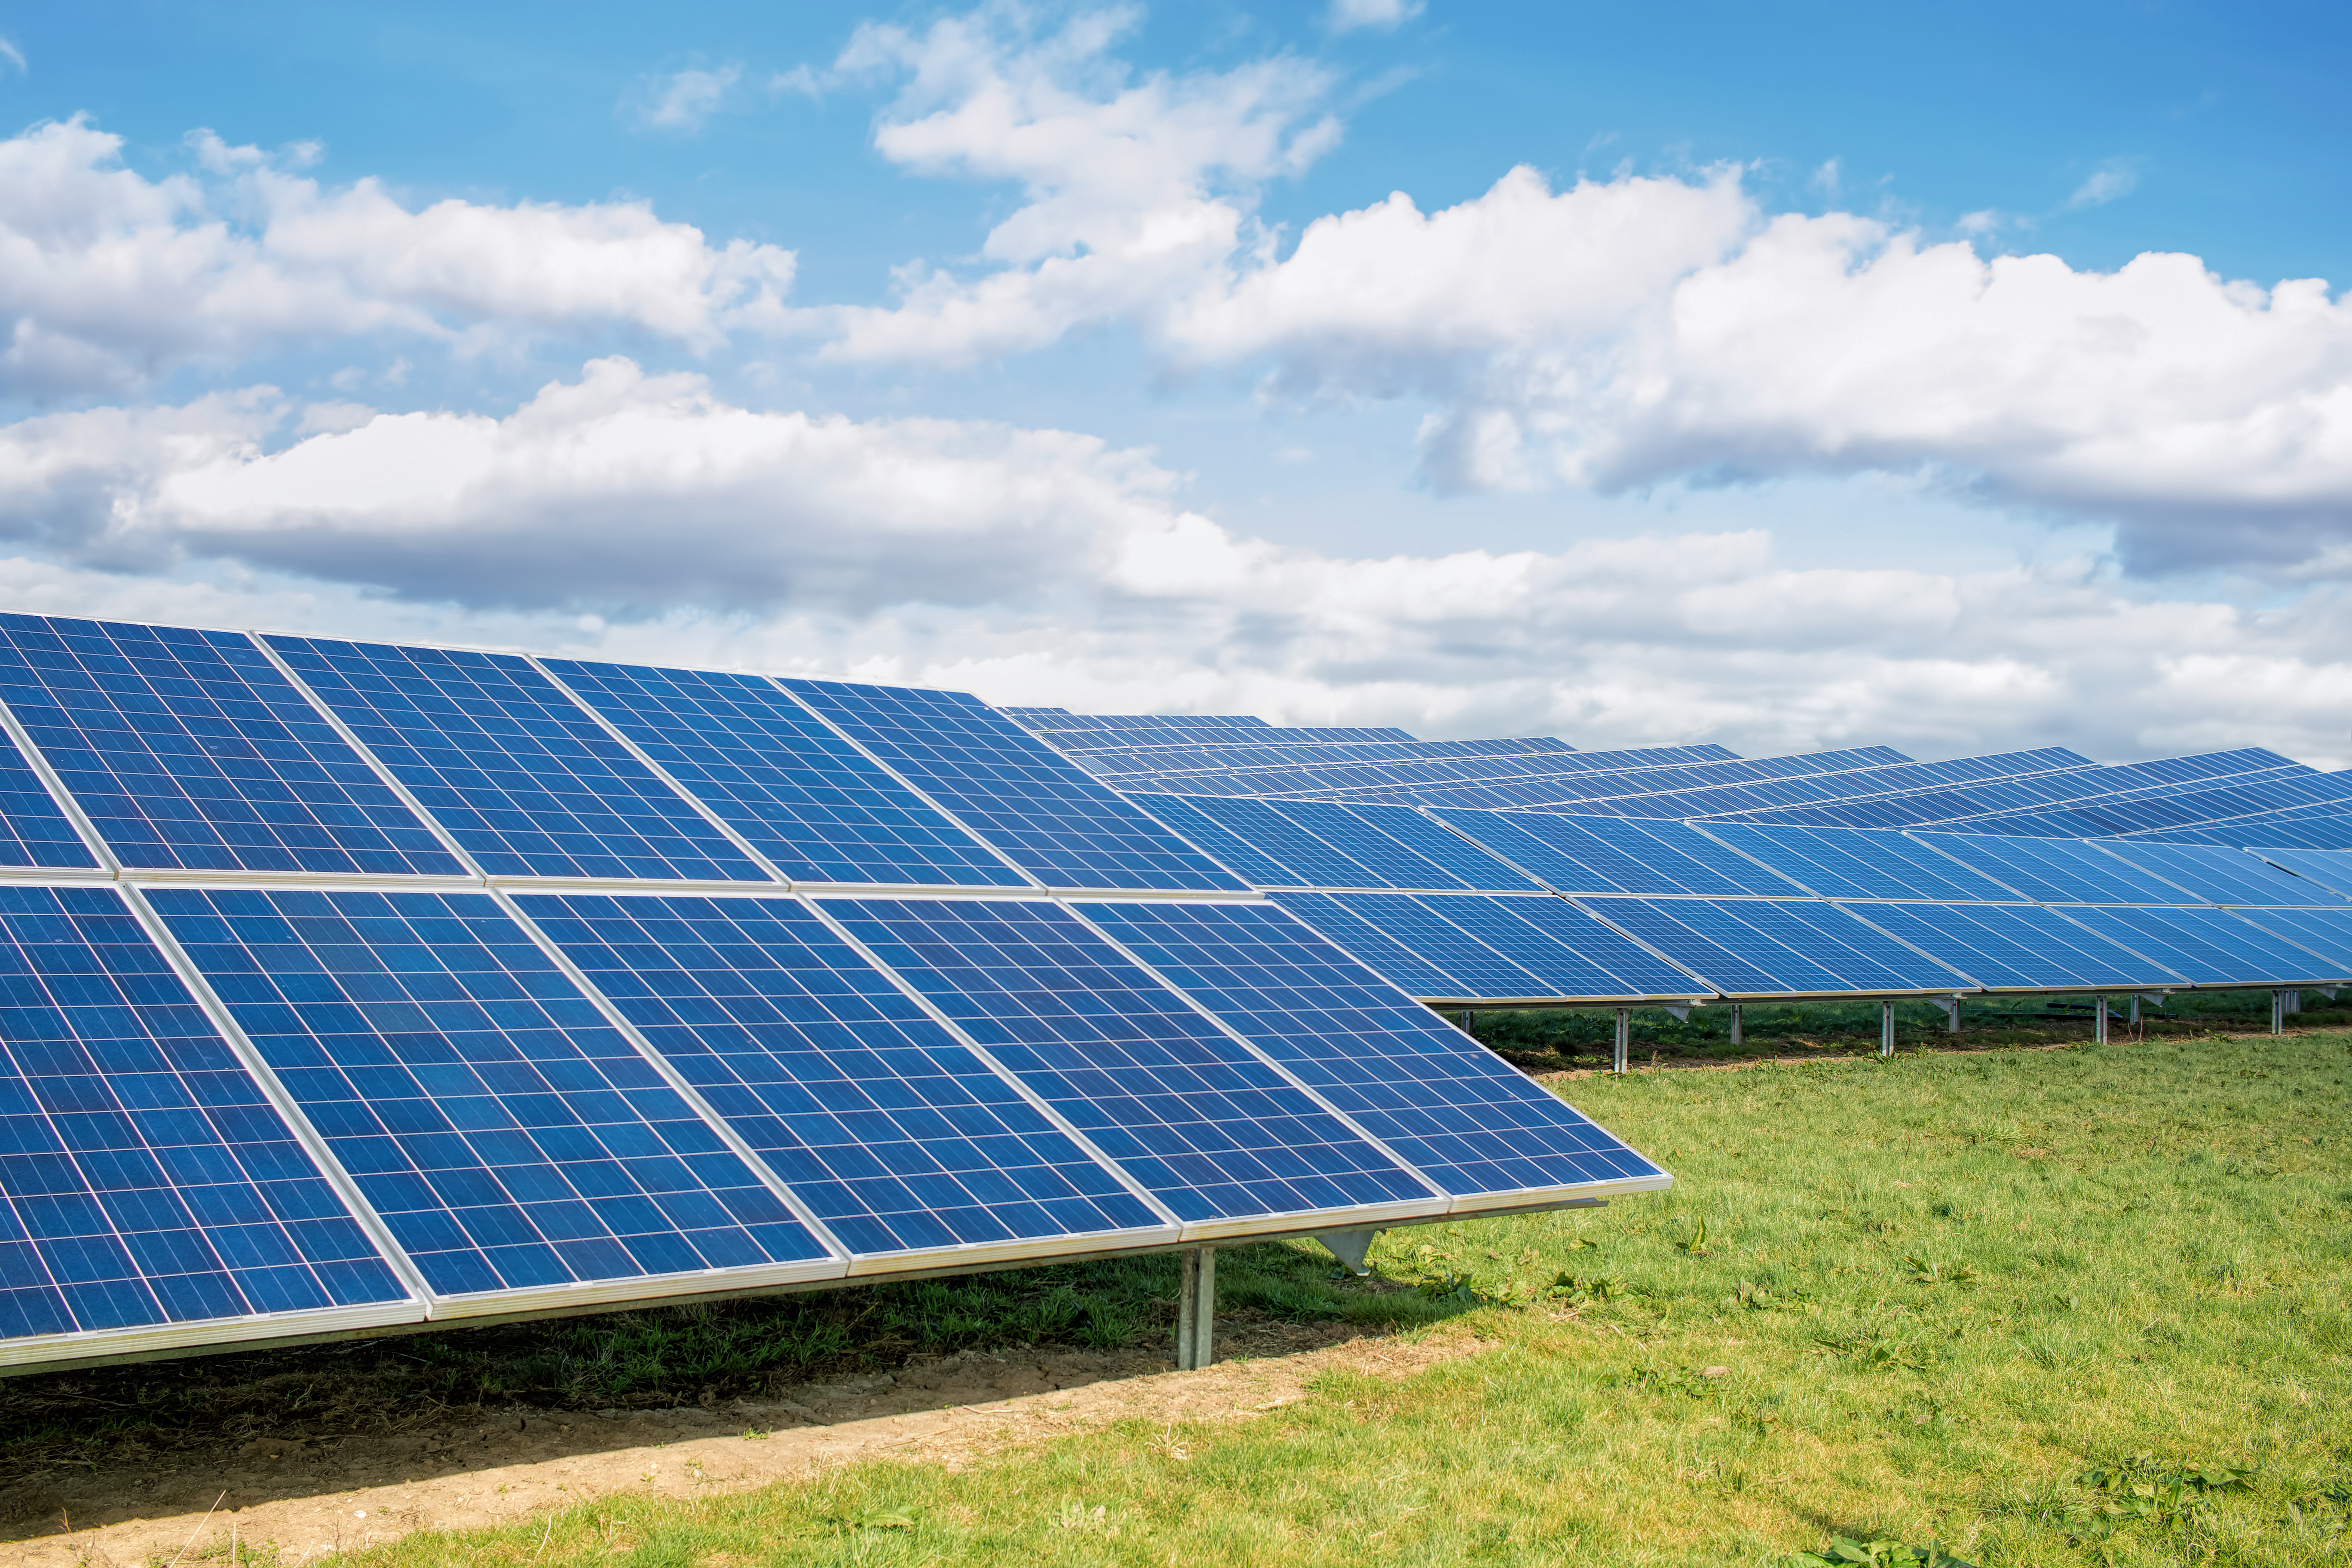 Solar Farm. Green Fields Blue Sky, Sustainable Renewable Energy.